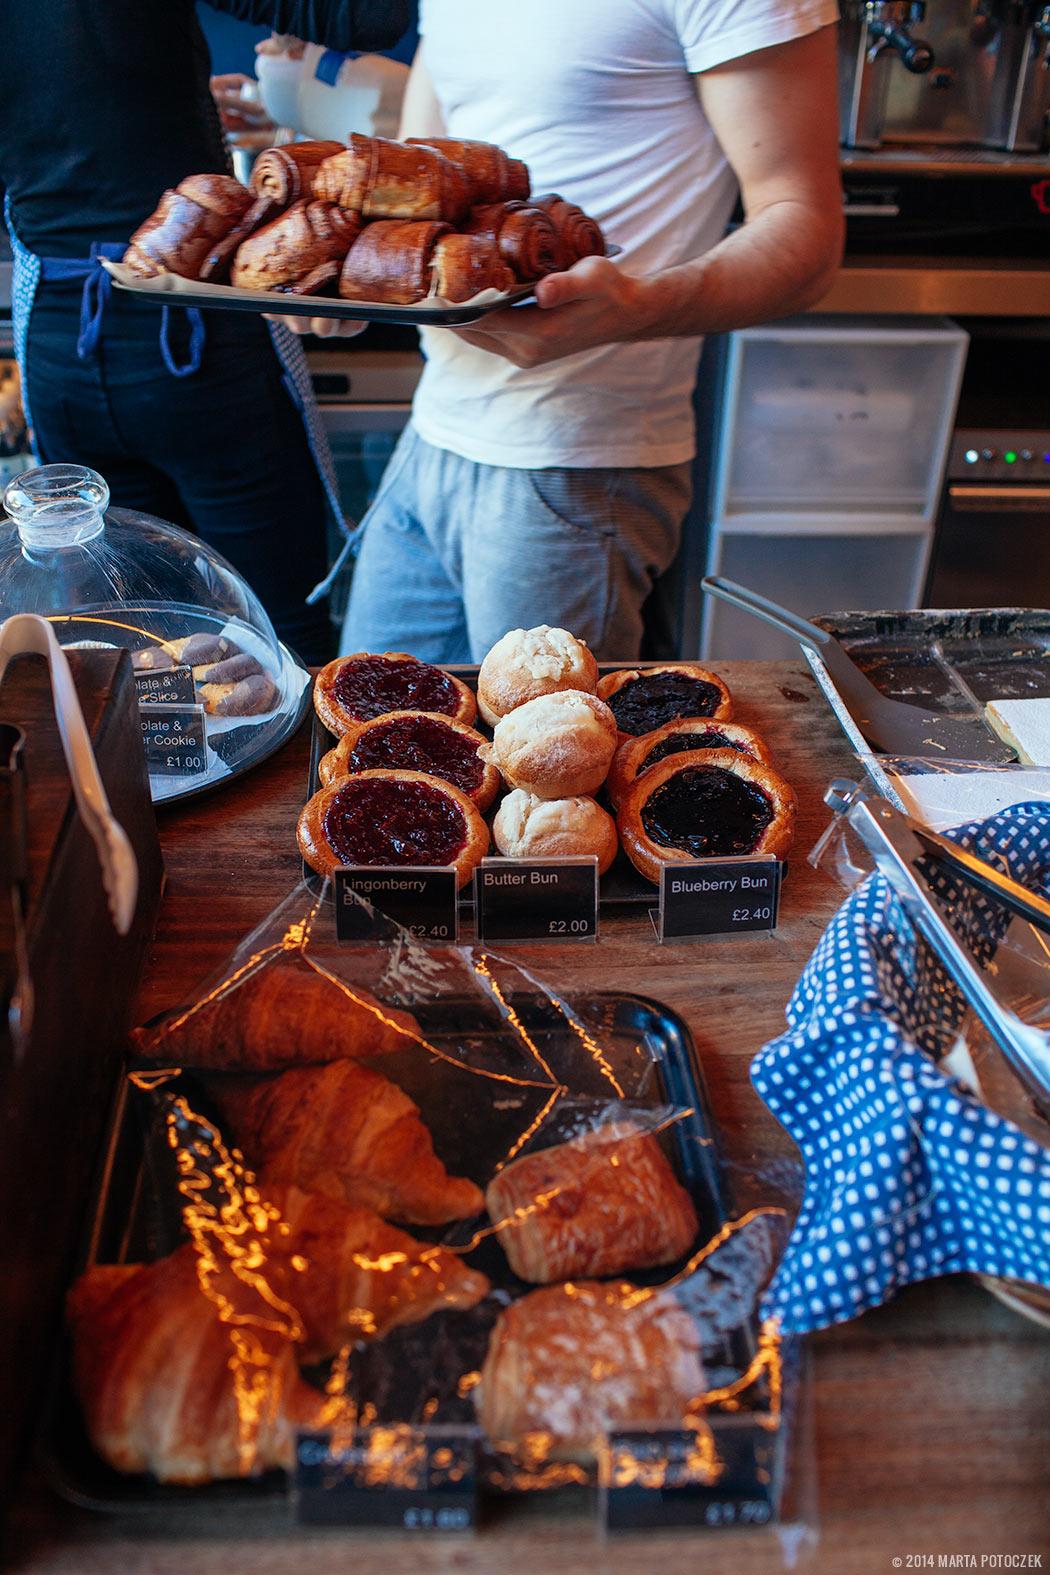 nordic_bakery_london_4